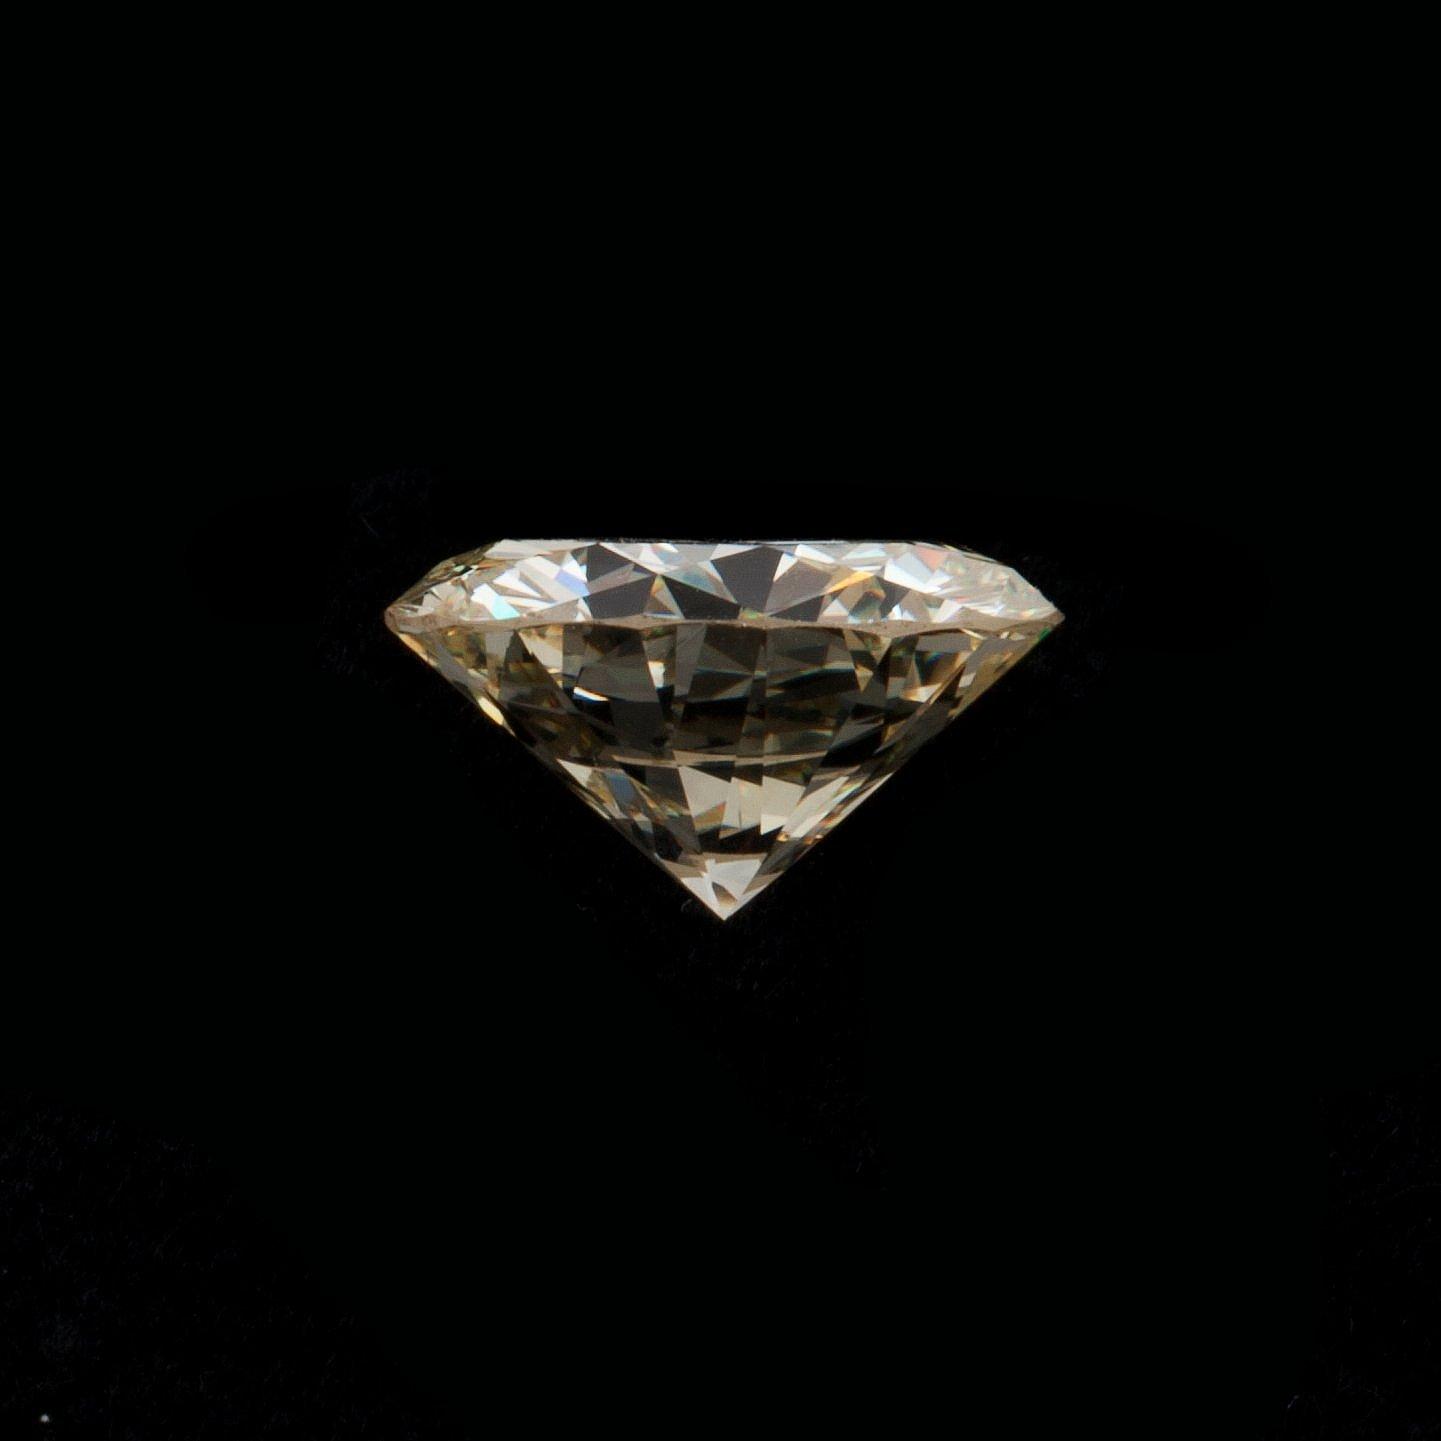 A loose 6 55 ct diamond  Light Yellow/VVS2-VS1  - Bukowskis